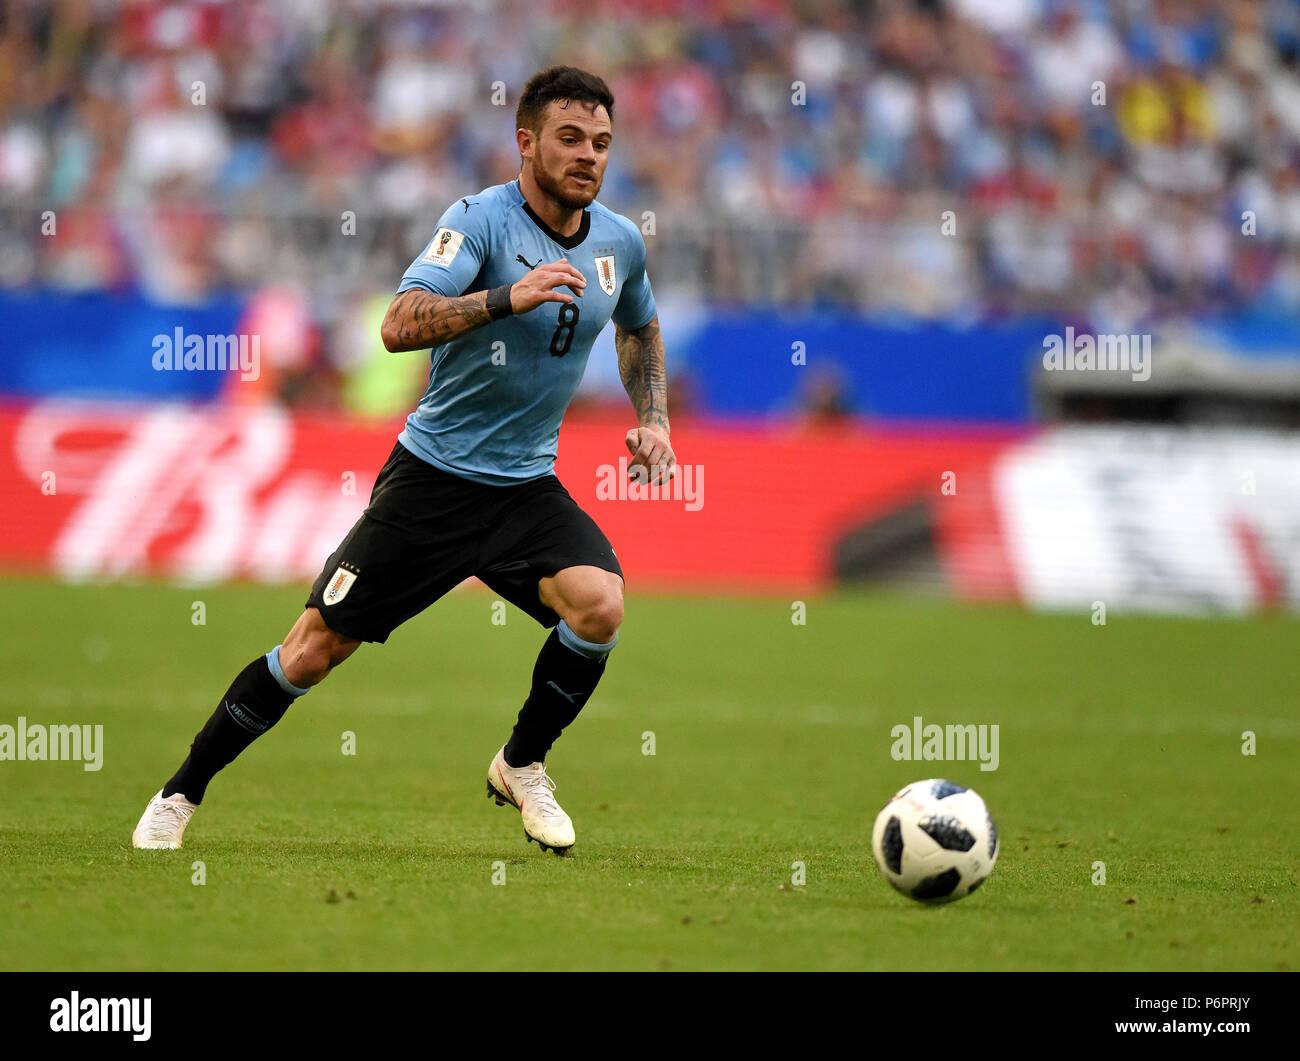 (COMPRA) NANDEZ Samara-russia-june-25-2018-uruguayan-midfielder-nahitan-nandez-during-fifa-world-cup-2018-match-uruguay-vs-russia-P6PRJY